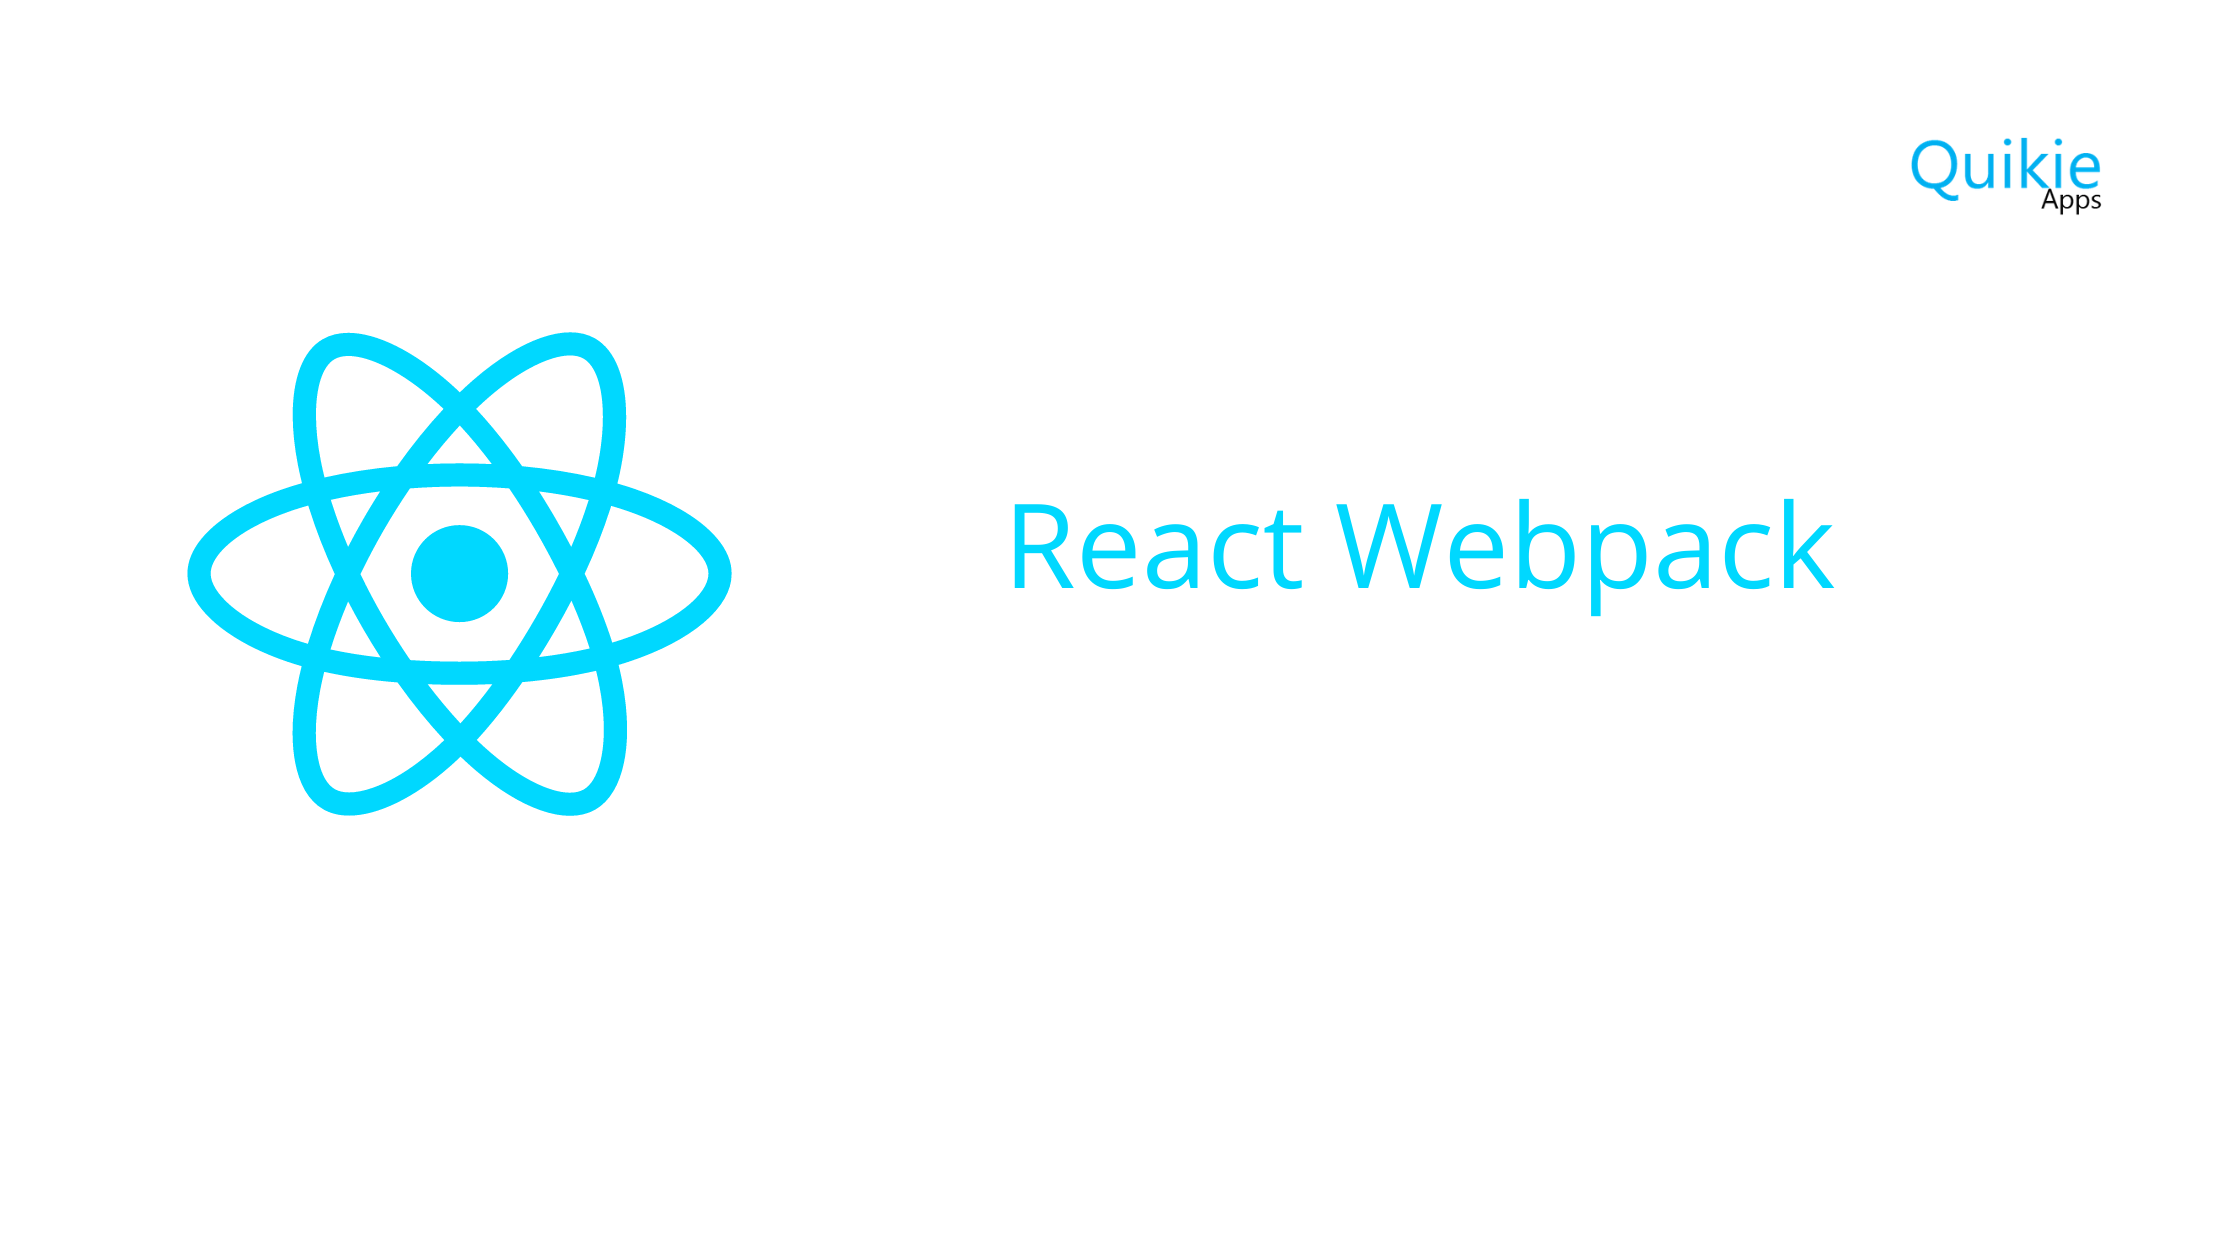 React Webpack